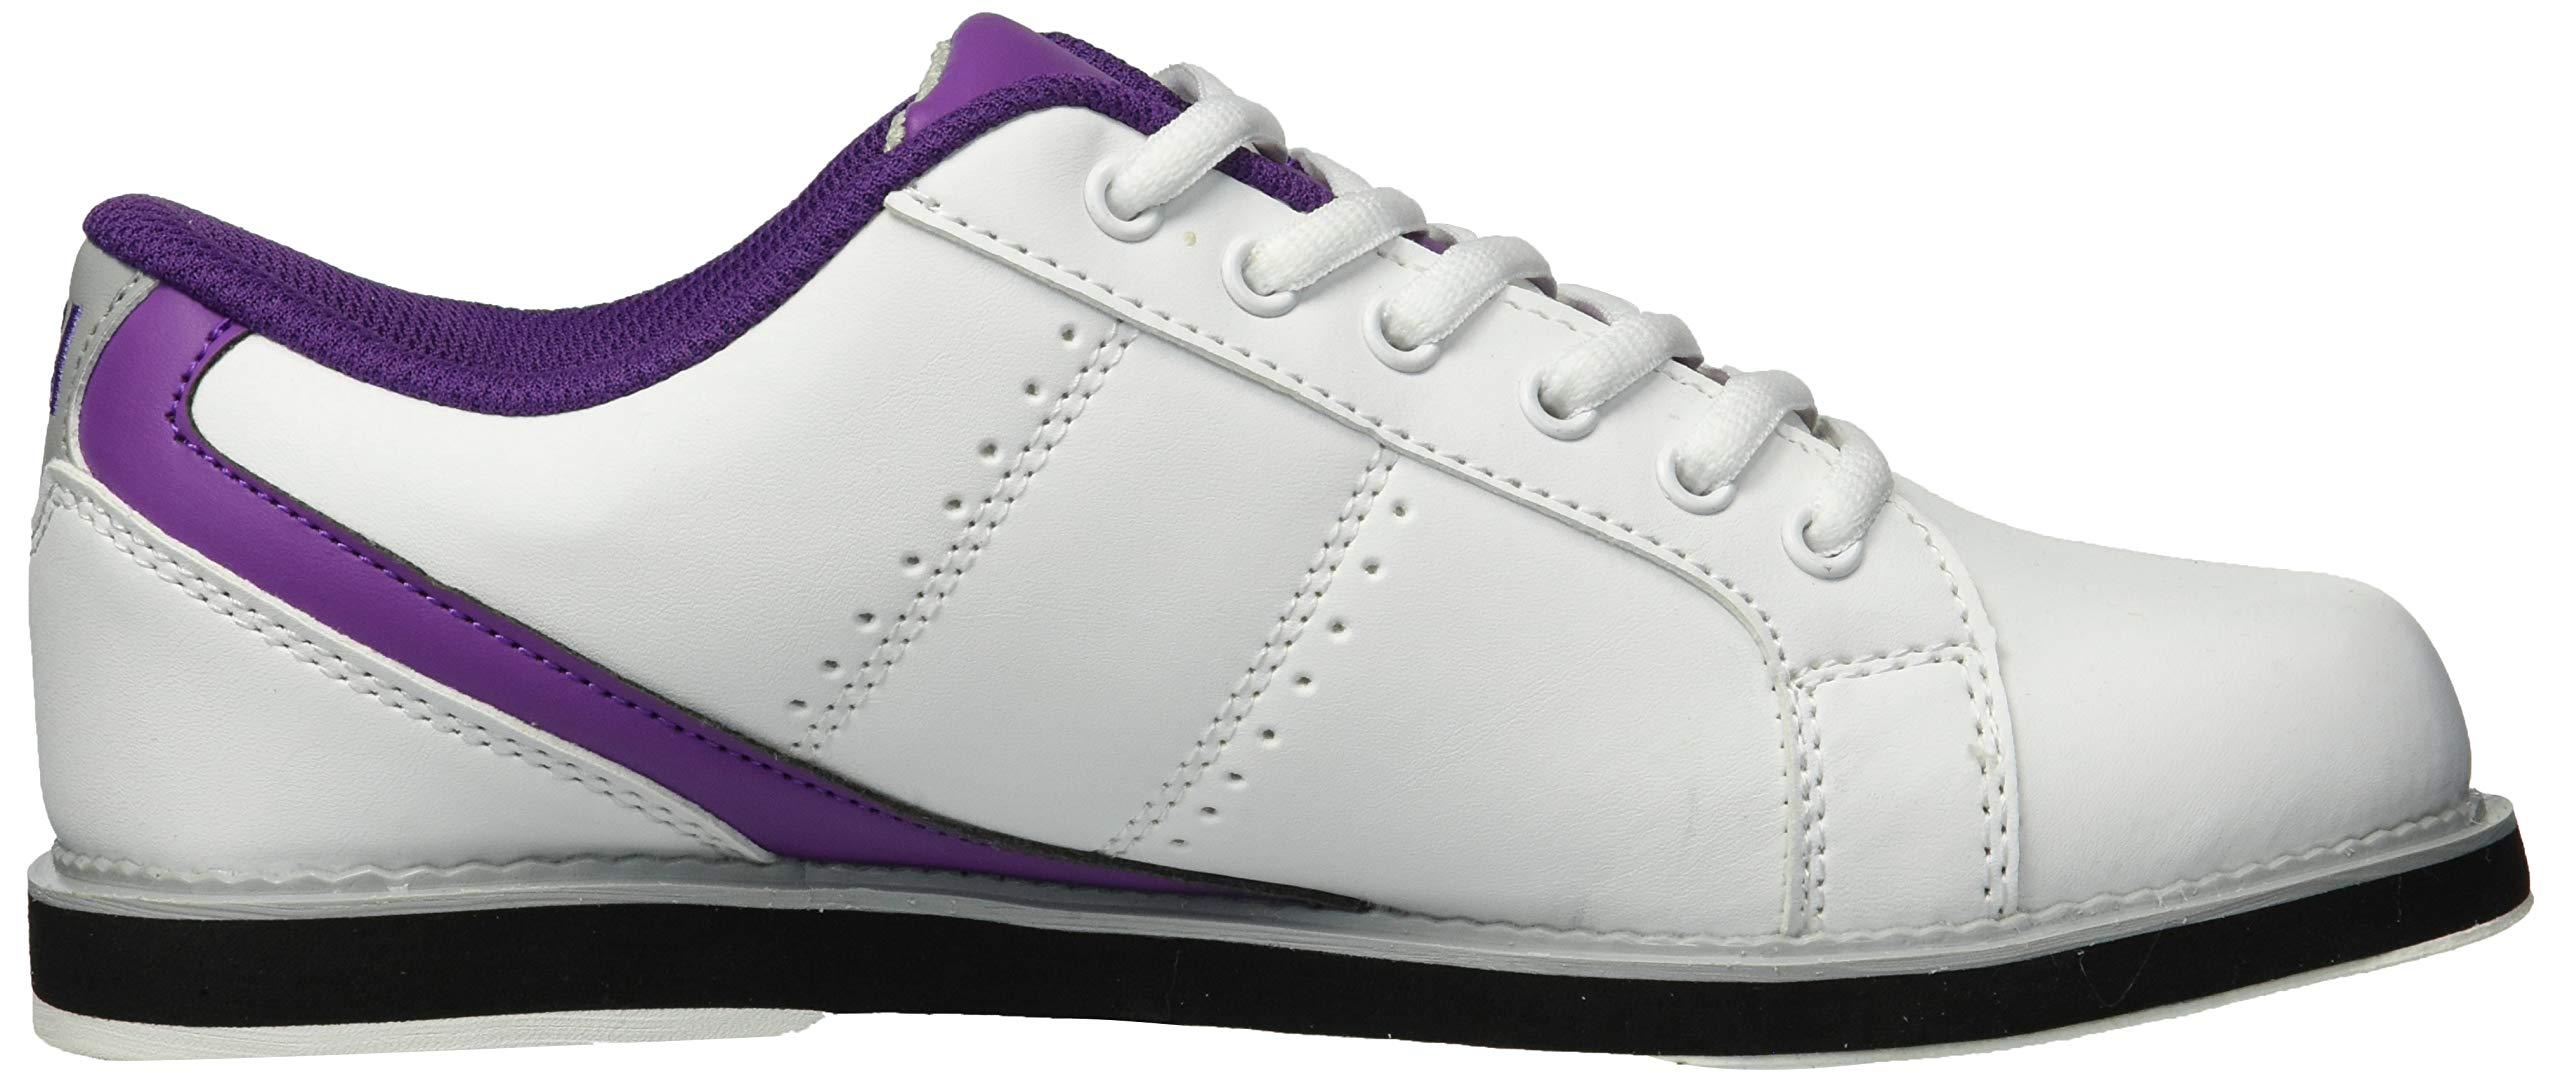 BSI Women's 460 Bowling Shoe, White/Purple, Size 7 by BSI (Image #7)